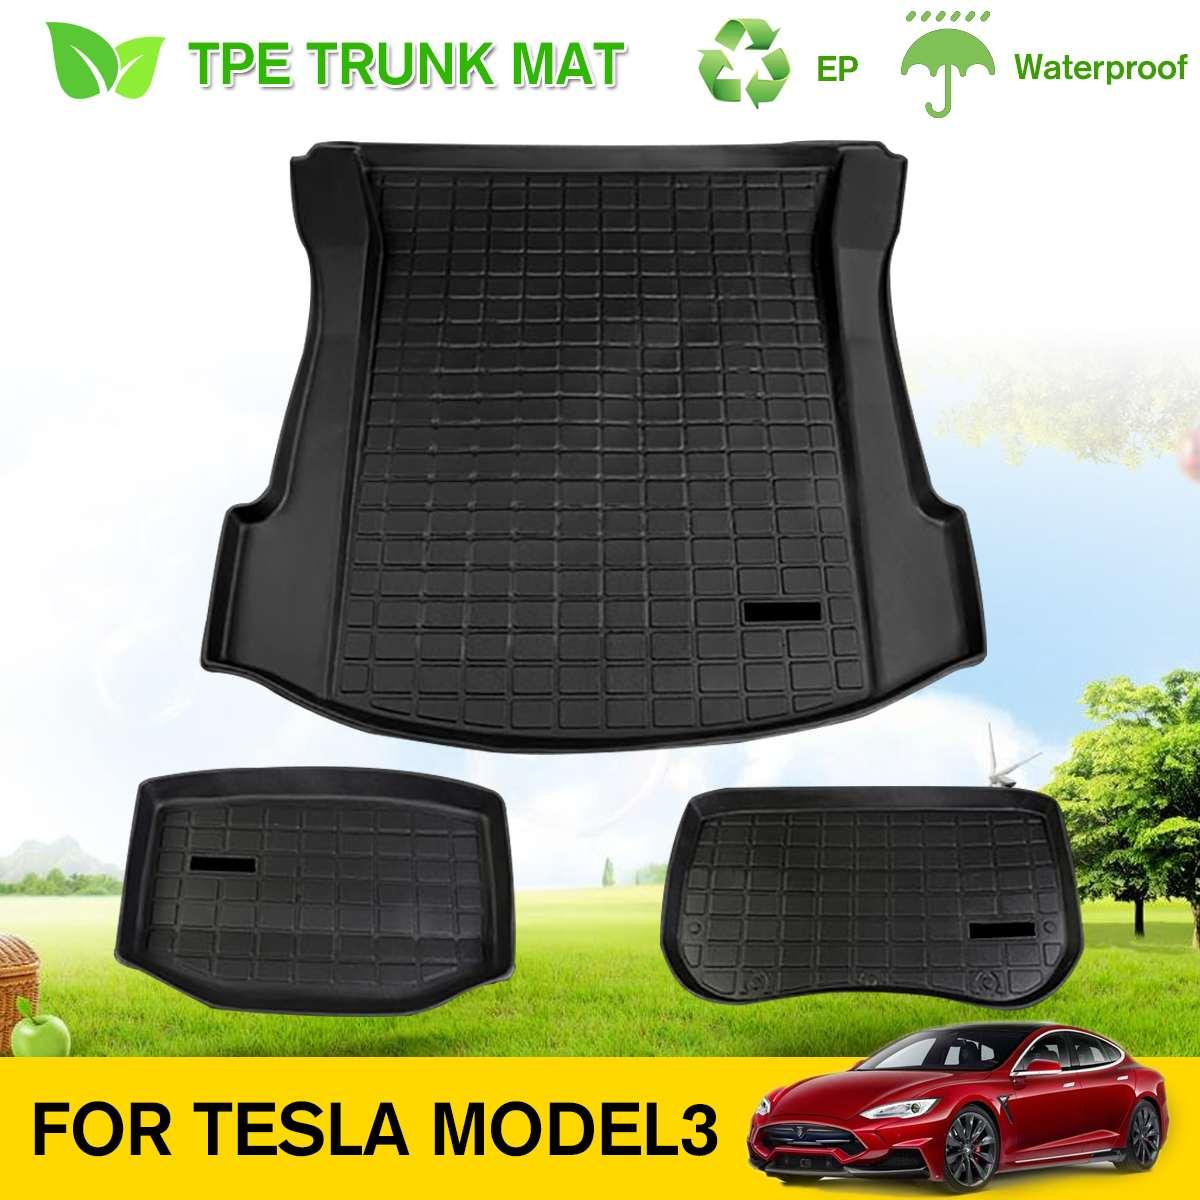 3Pcs Cargo Liner Rear Cargo Tray Trunk Floor Mat Under the Trunk Black TPE Waterproof Mat Customized for Tesla Model 3